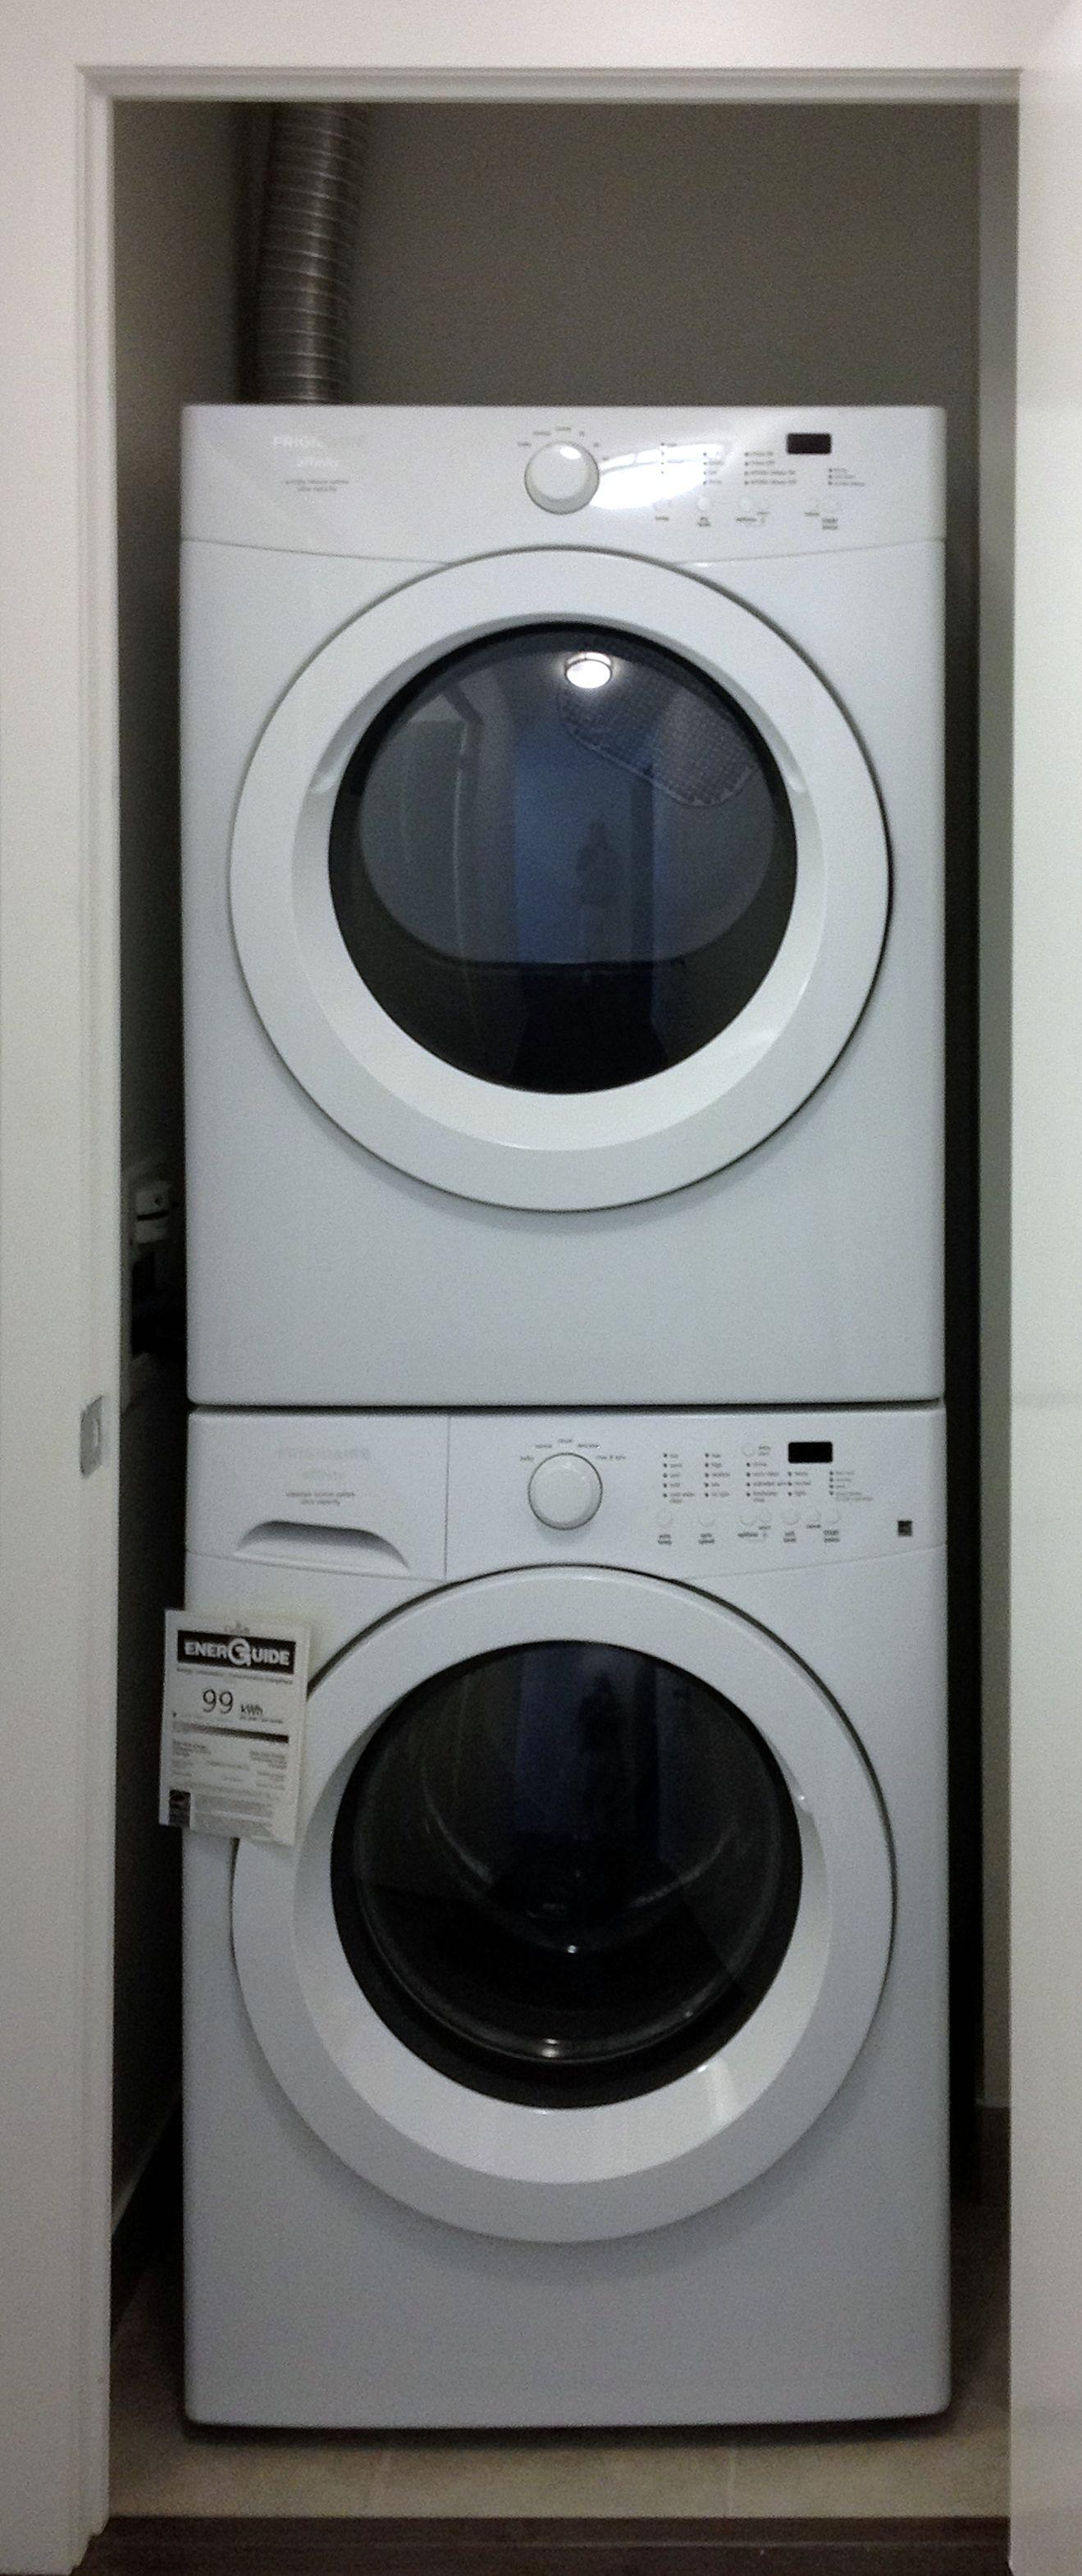 Washer Dryer Combo Reviews Washing Machine